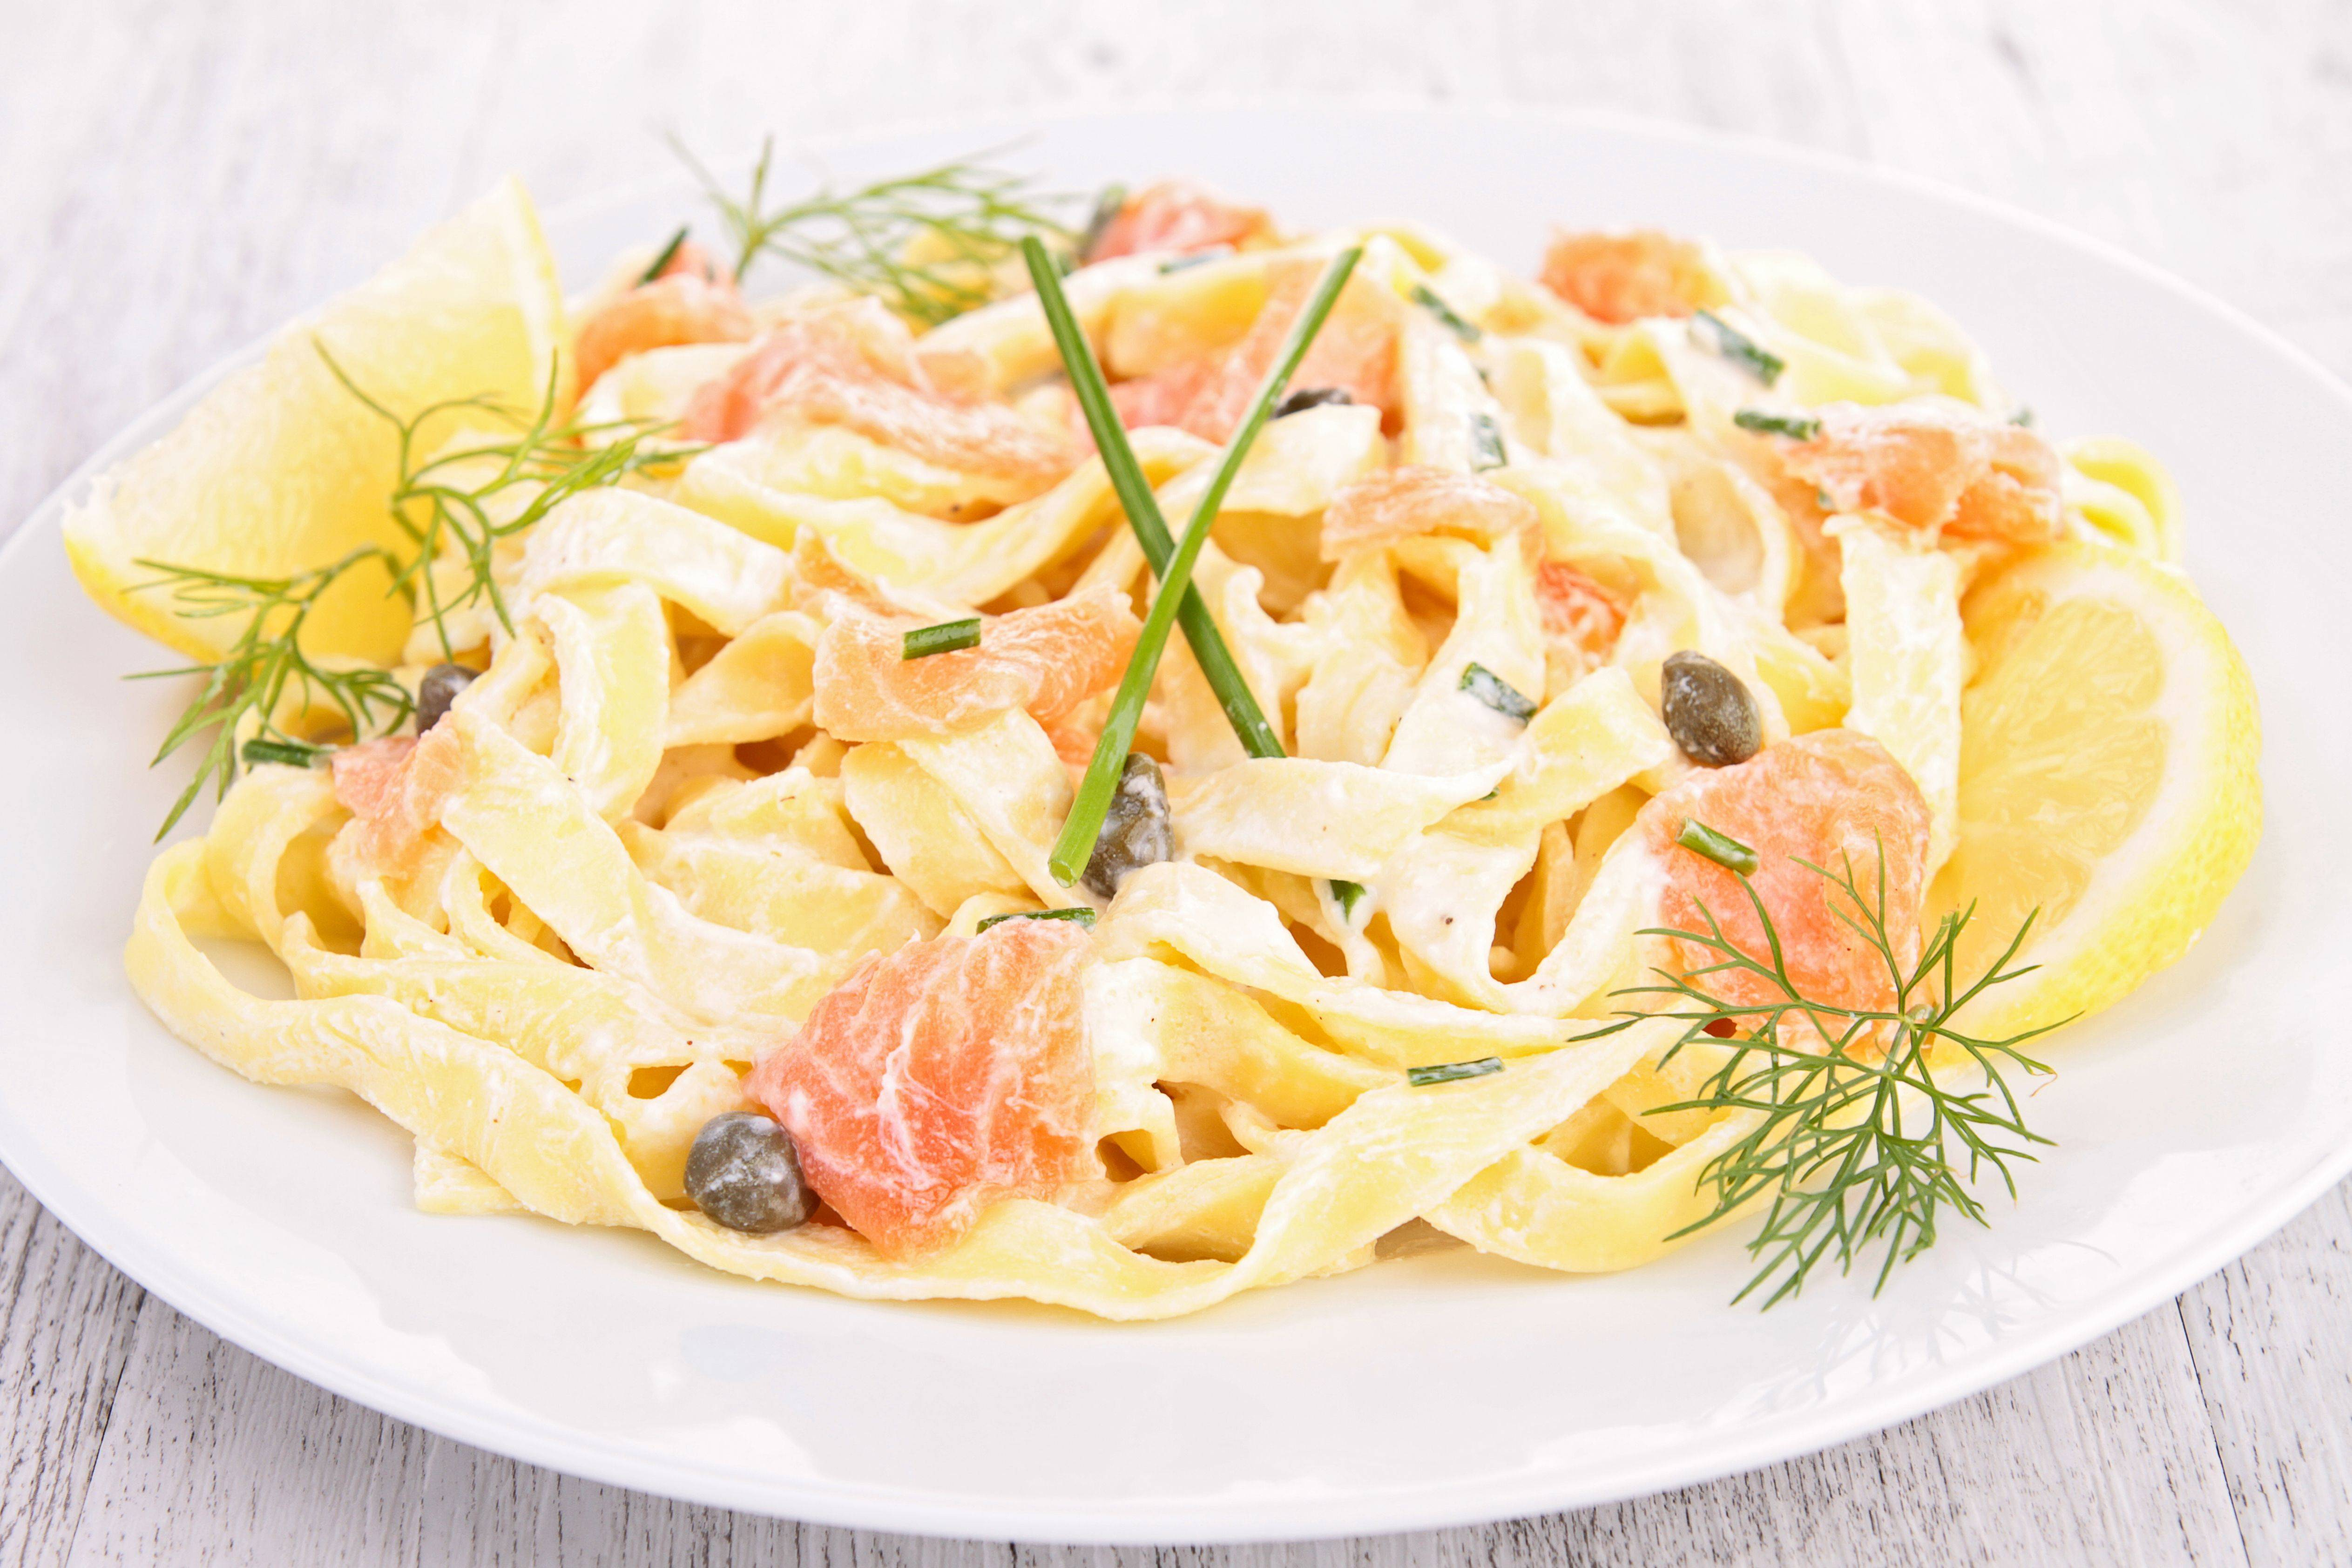 Домашние фетучини с лососем в сливочном соусе | сало — сила!